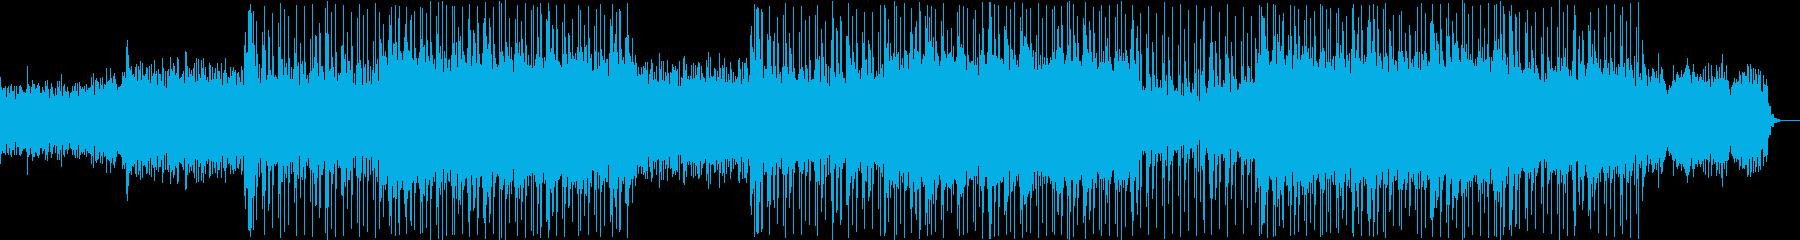 EDM映画やアニメのシリアスな映像向けの再生済みの波形